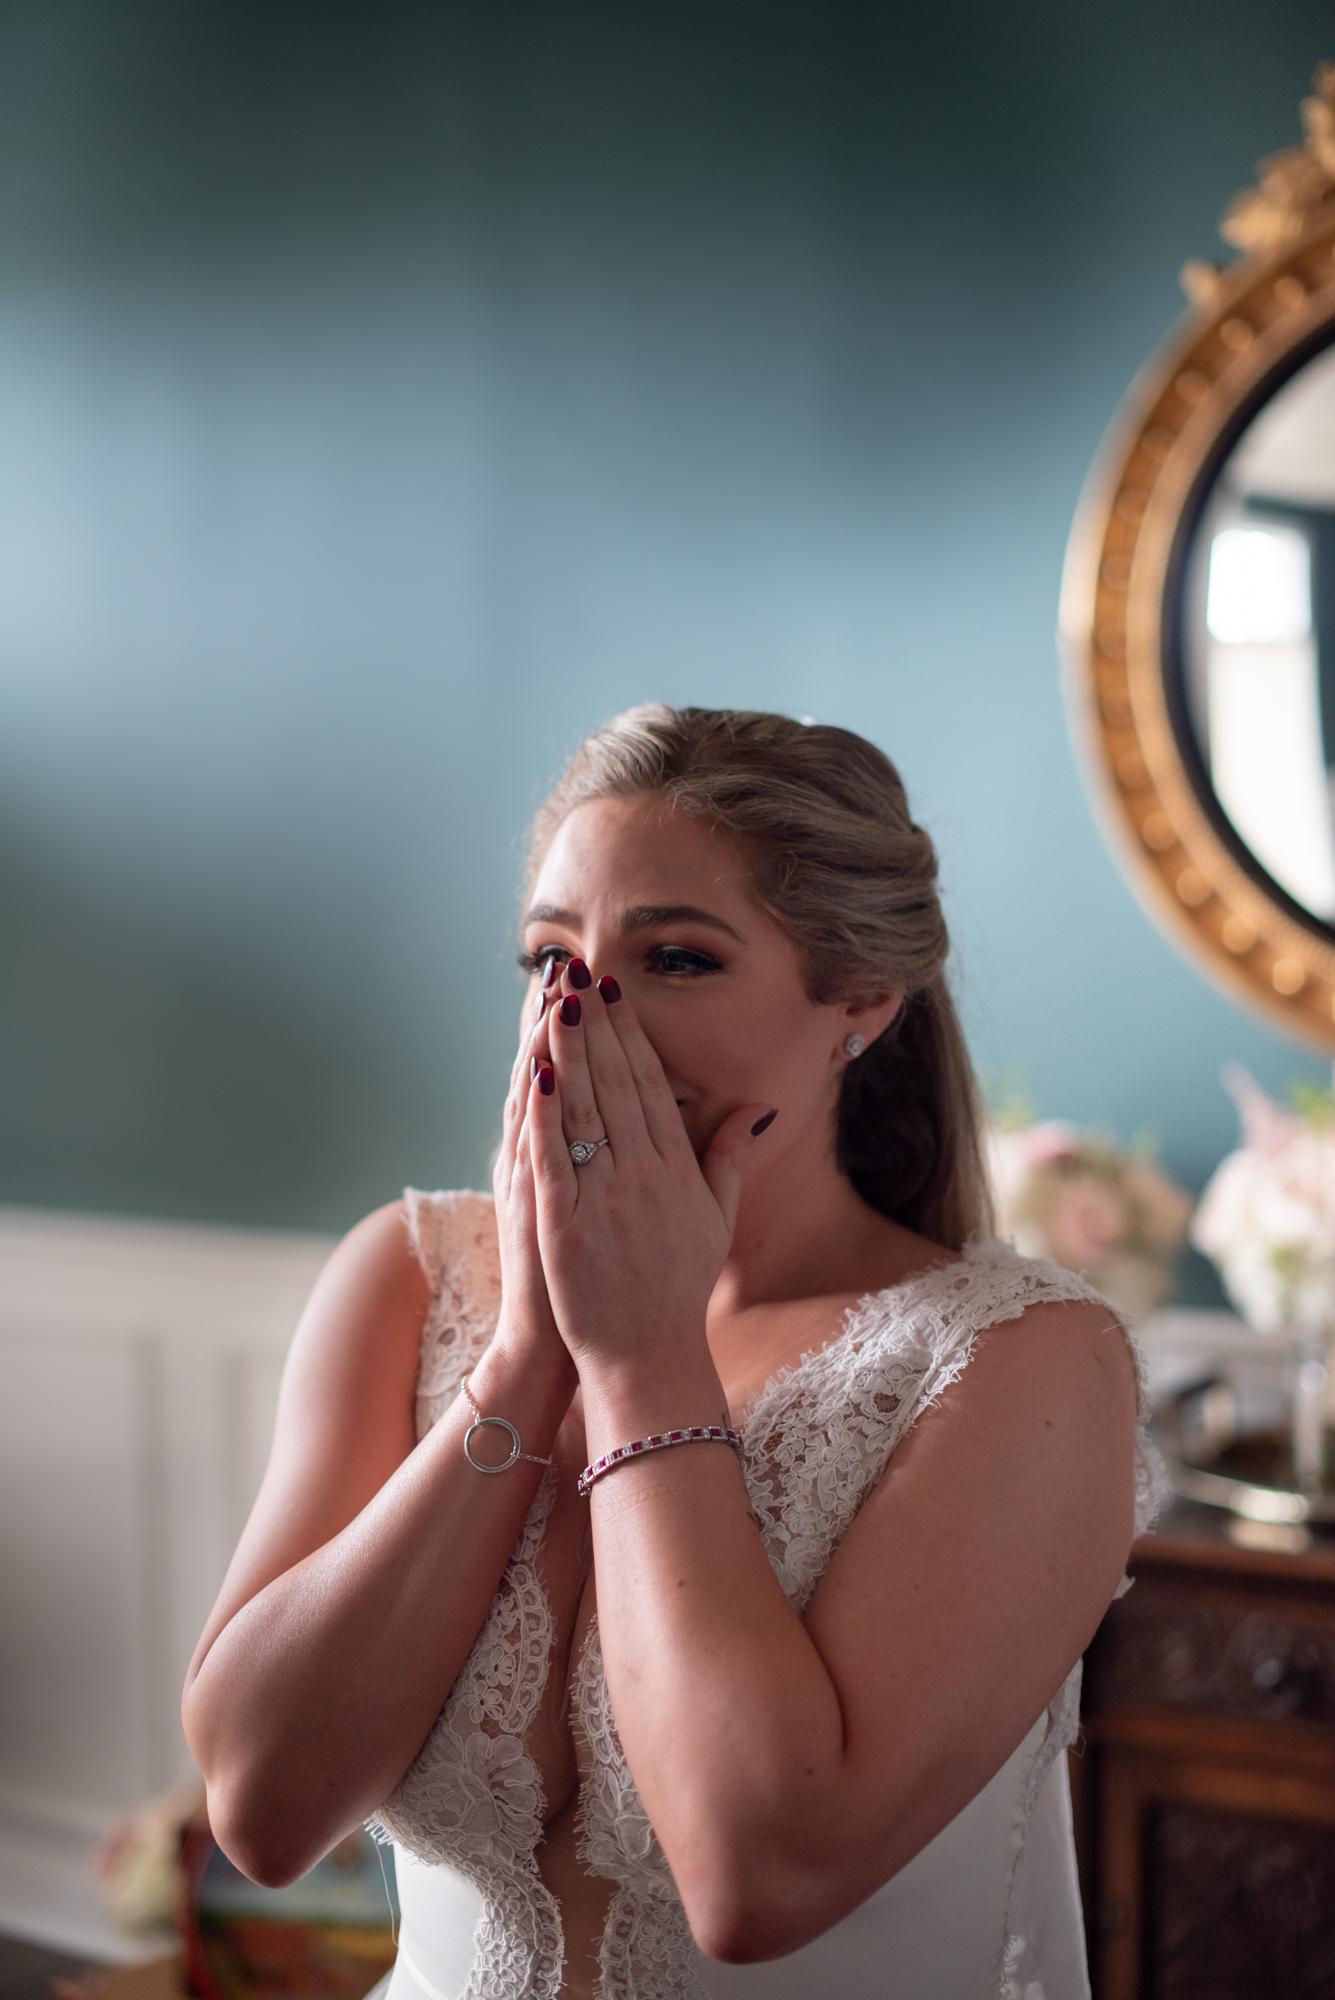 st-augustine-photographer-st-augustine-gay-wedding-sam-sex-wedding-photographer-sarah-annay-photography-white-room-weddings-15.jpg